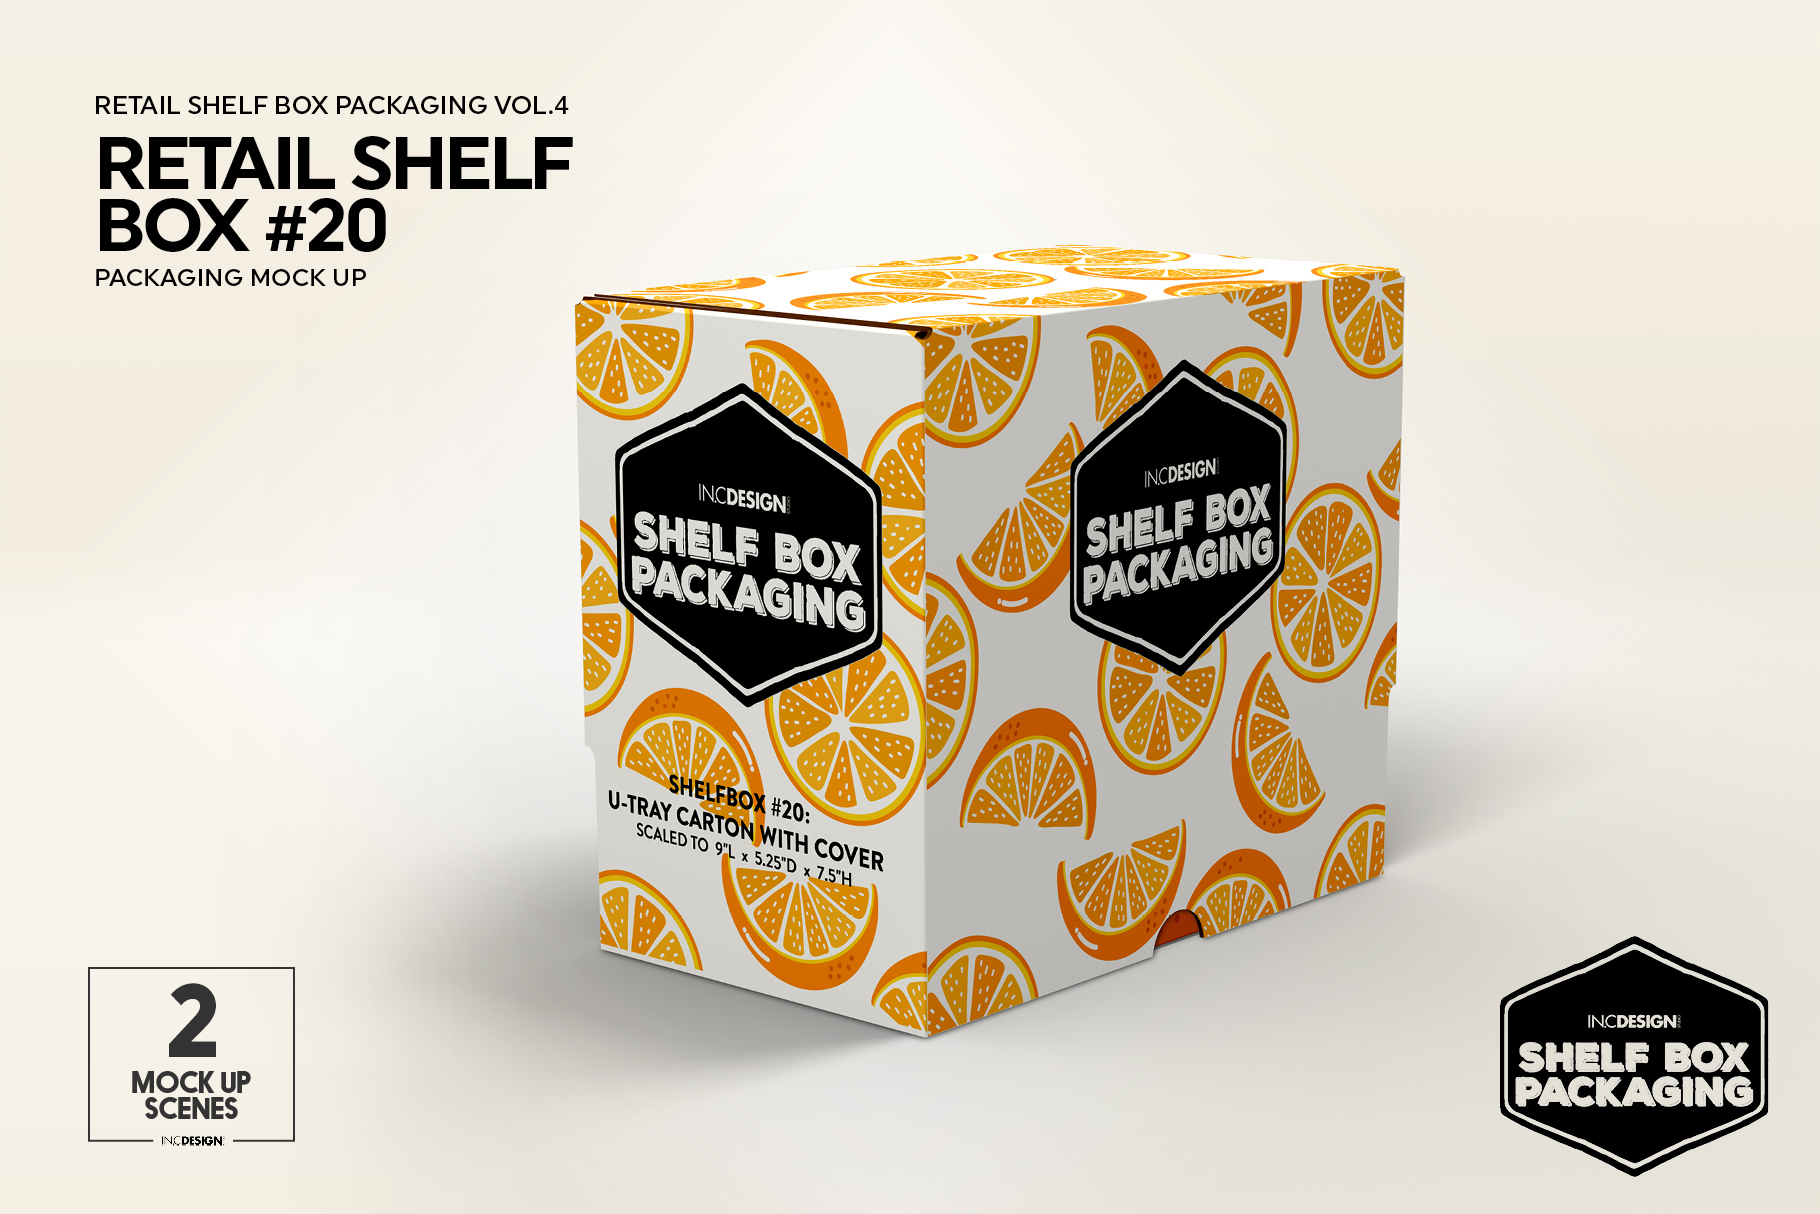 Retail Shelf Box 20 Packaging Mockup example image 7